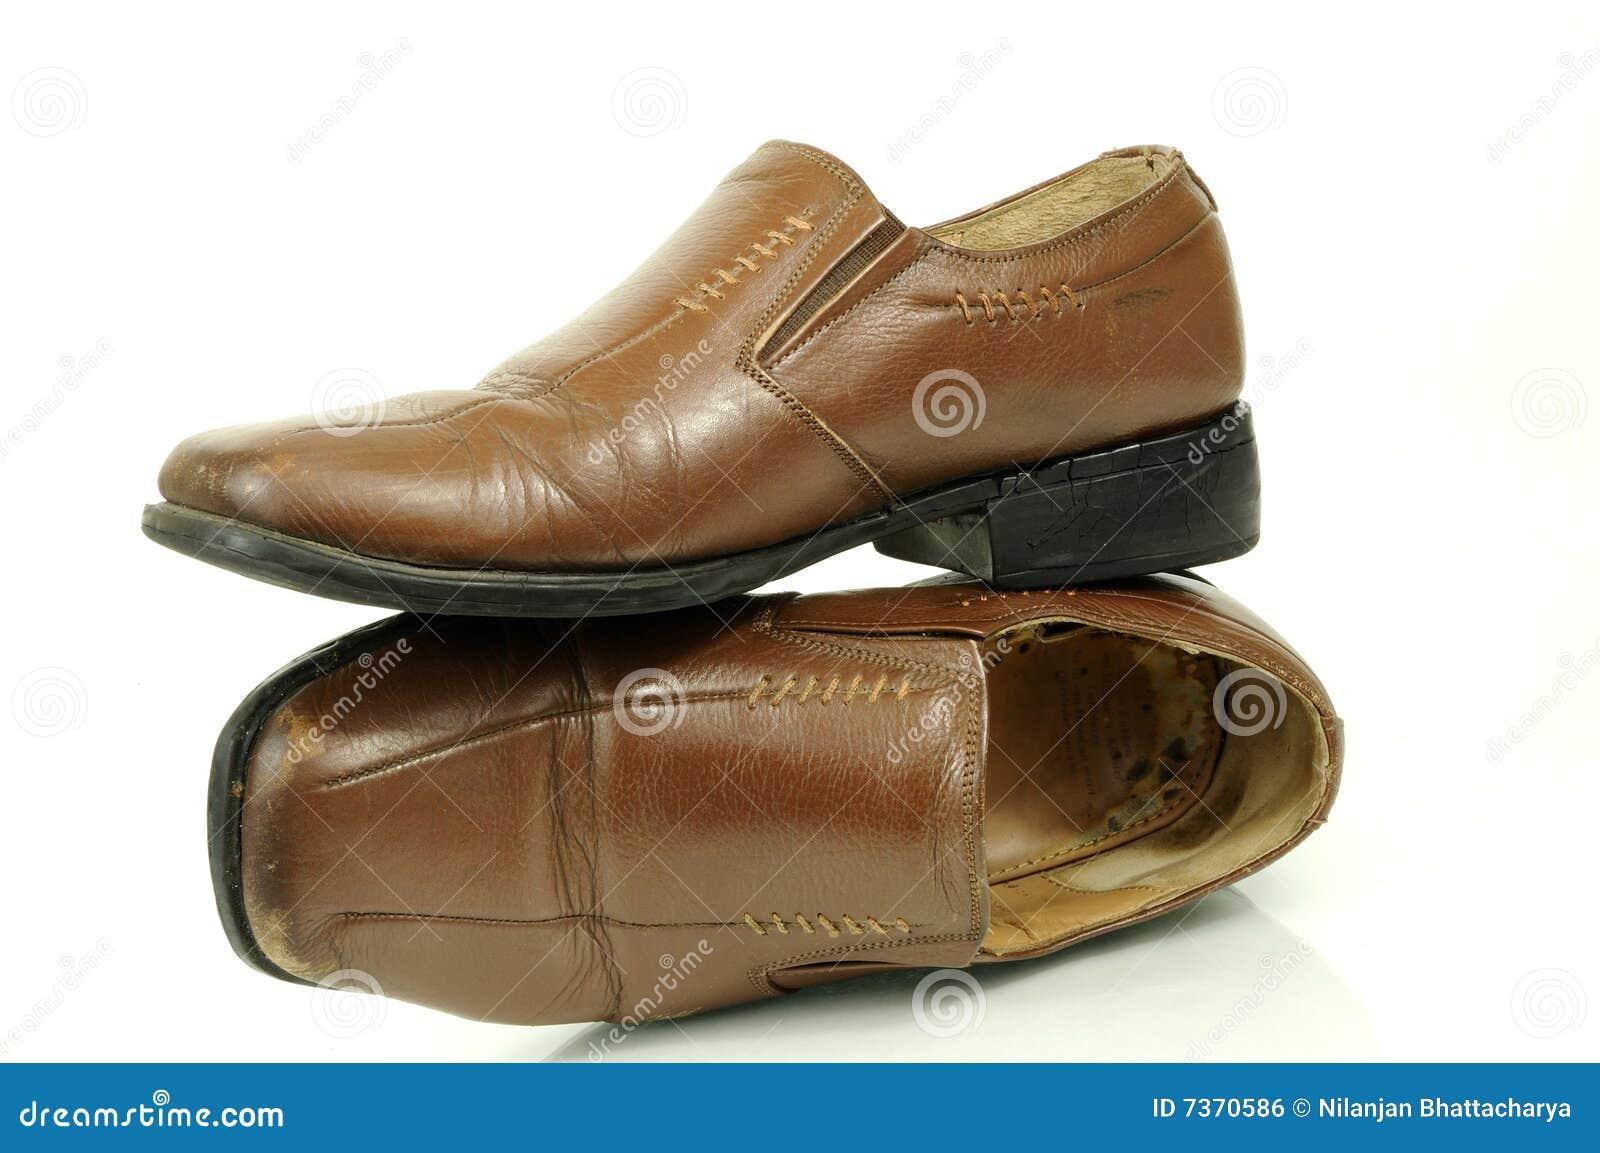 0c2033e3481 μοντέρνος παπουτσιών ατόμων μόδας έξω που φοριέται. Οι Σχεδιαστές Επέλεξαν  Επίσης αυτές τις Στοκ Φωτογραφίες